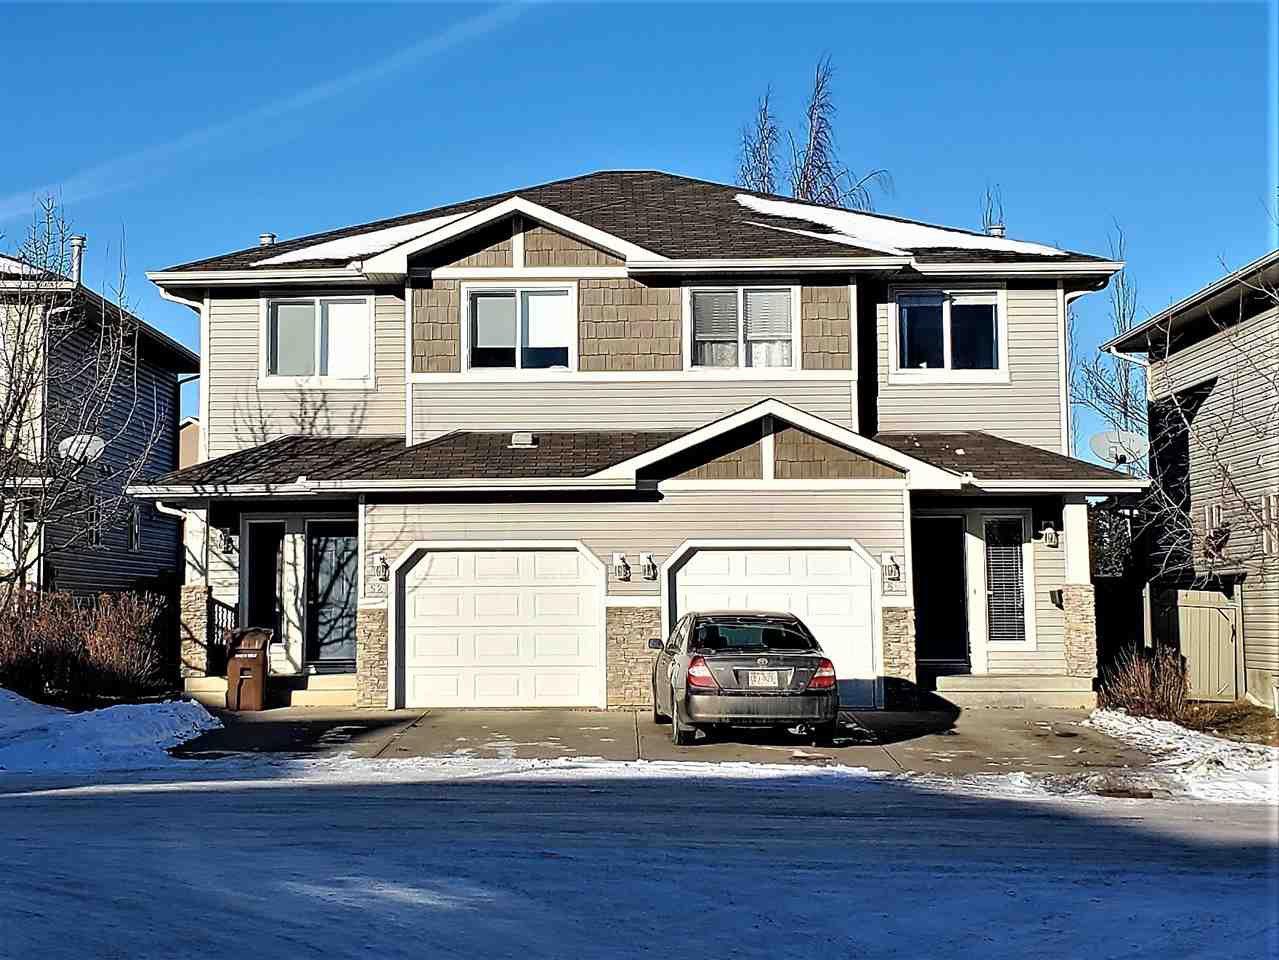 Main Photo: 3 133 EASTGATE Way: St. Albert House Half Duplex for sale : MLS®# E4223741